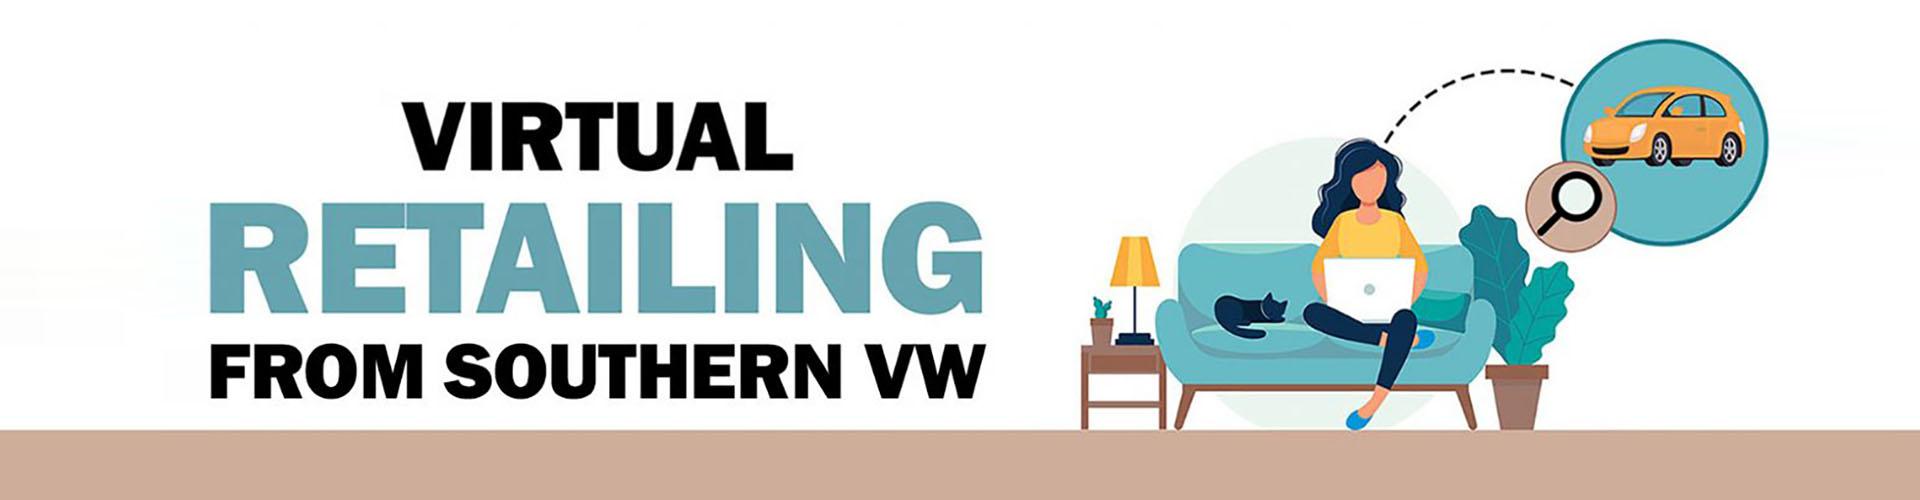 southernvw-pb-virtualretailing-jul20-hn